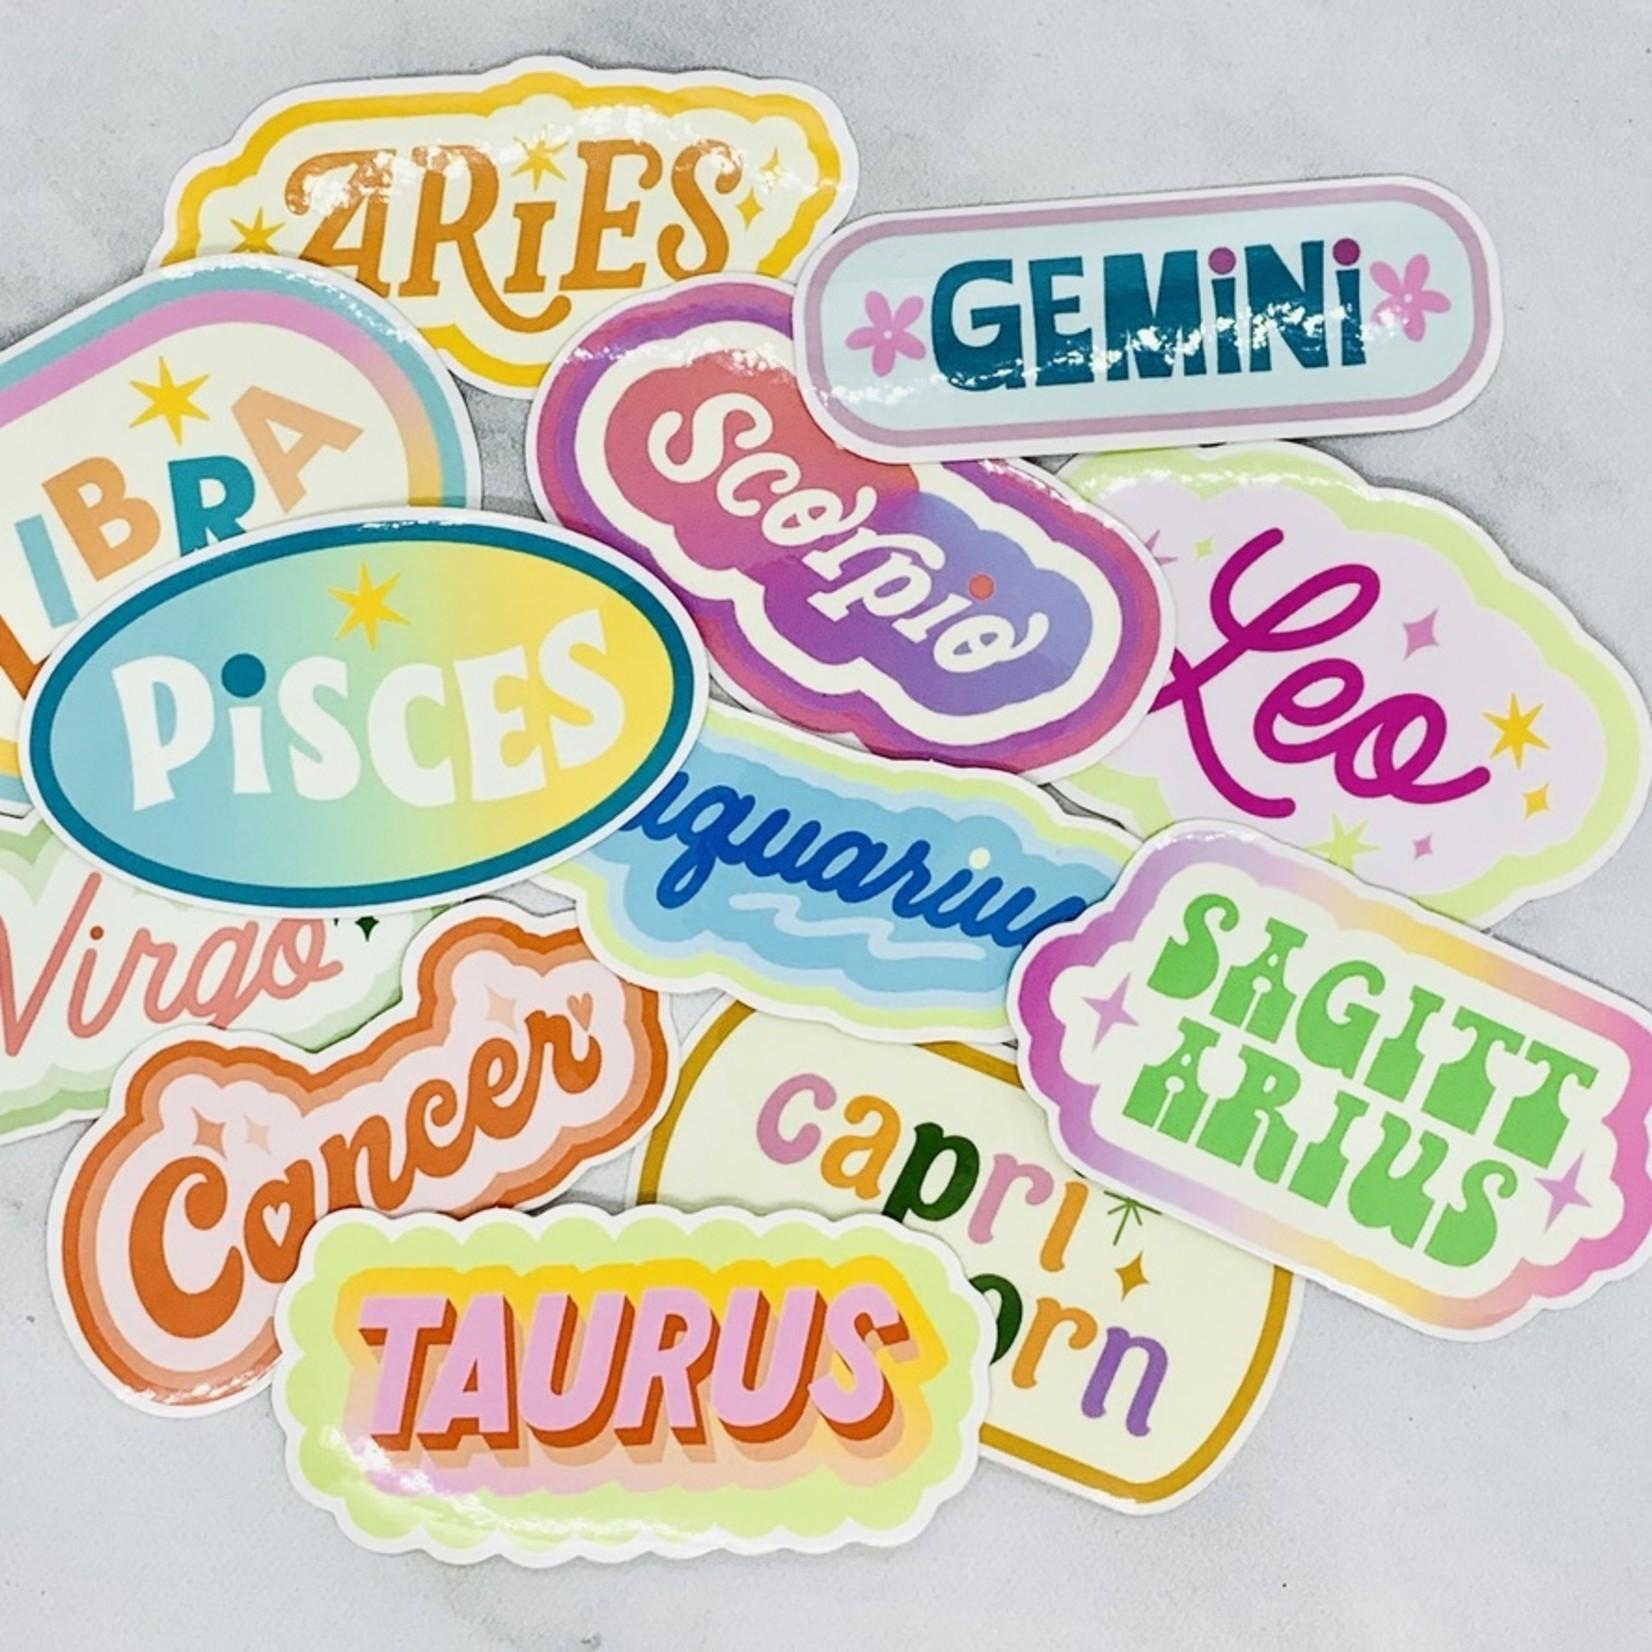 Have A Nice Day c/o Faire Zodiac Sticker